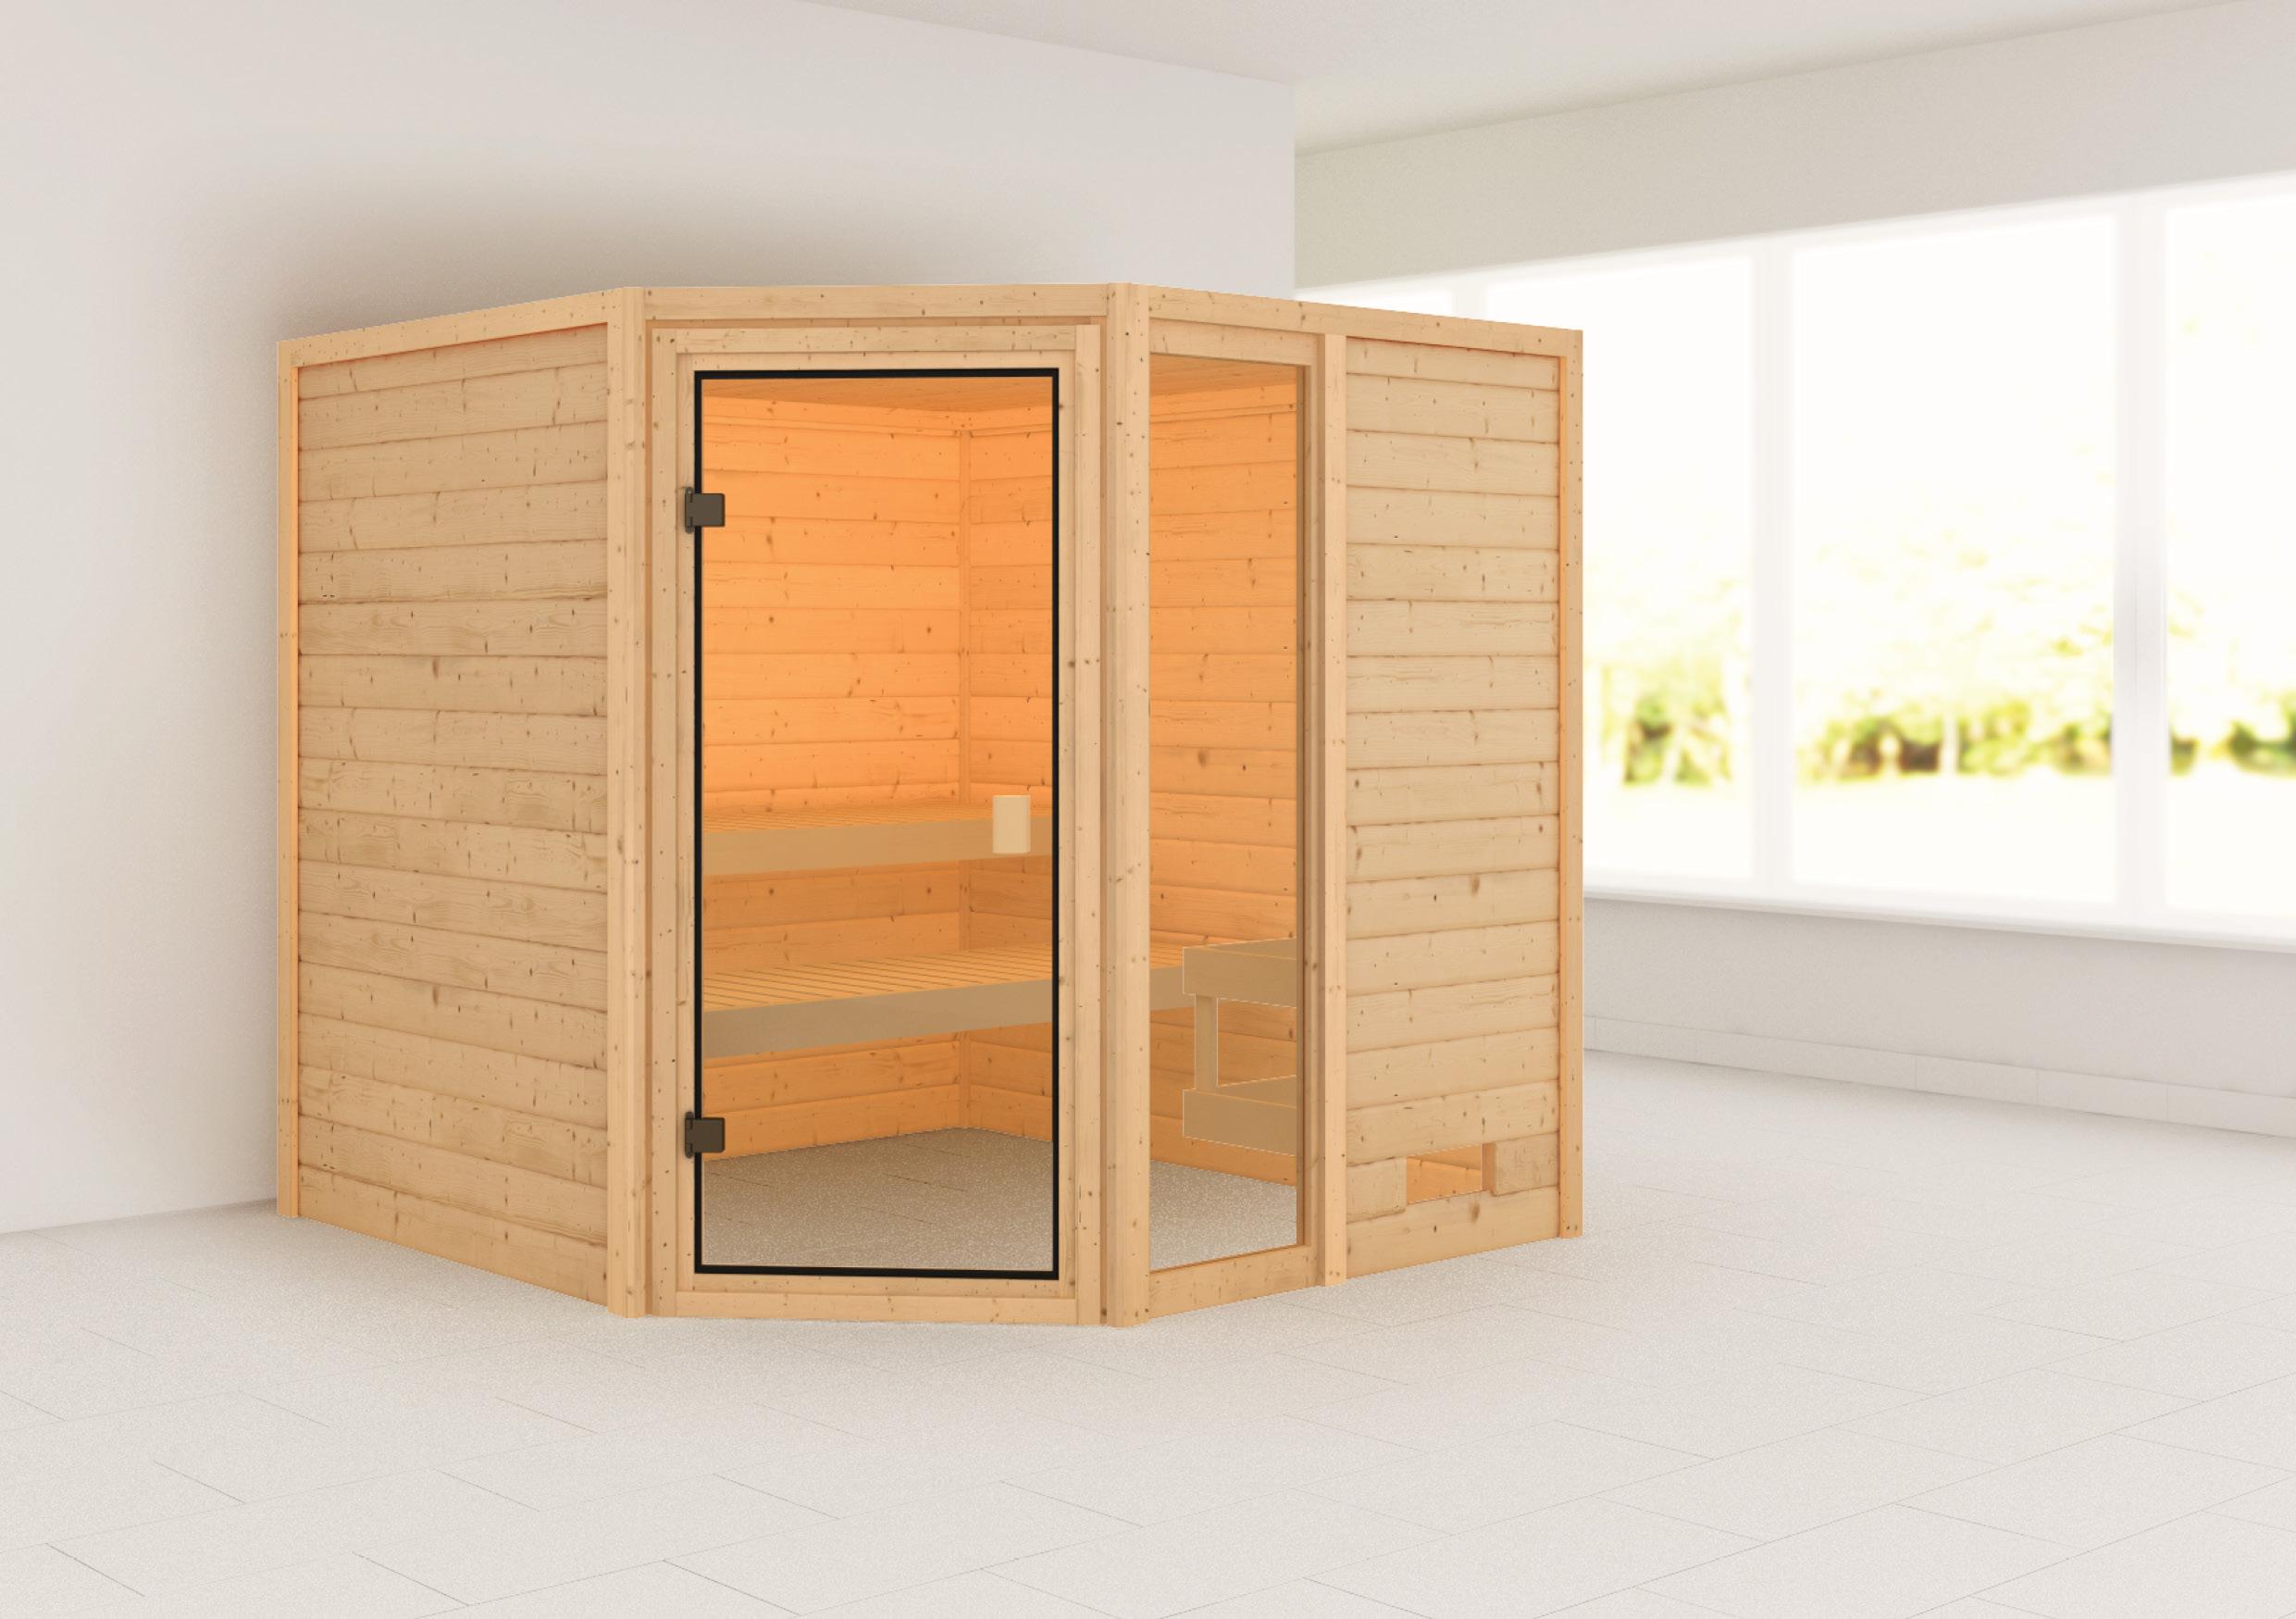 Woodfeeling Sauna Tabea 38mm ohne Saunaofen Bild 1